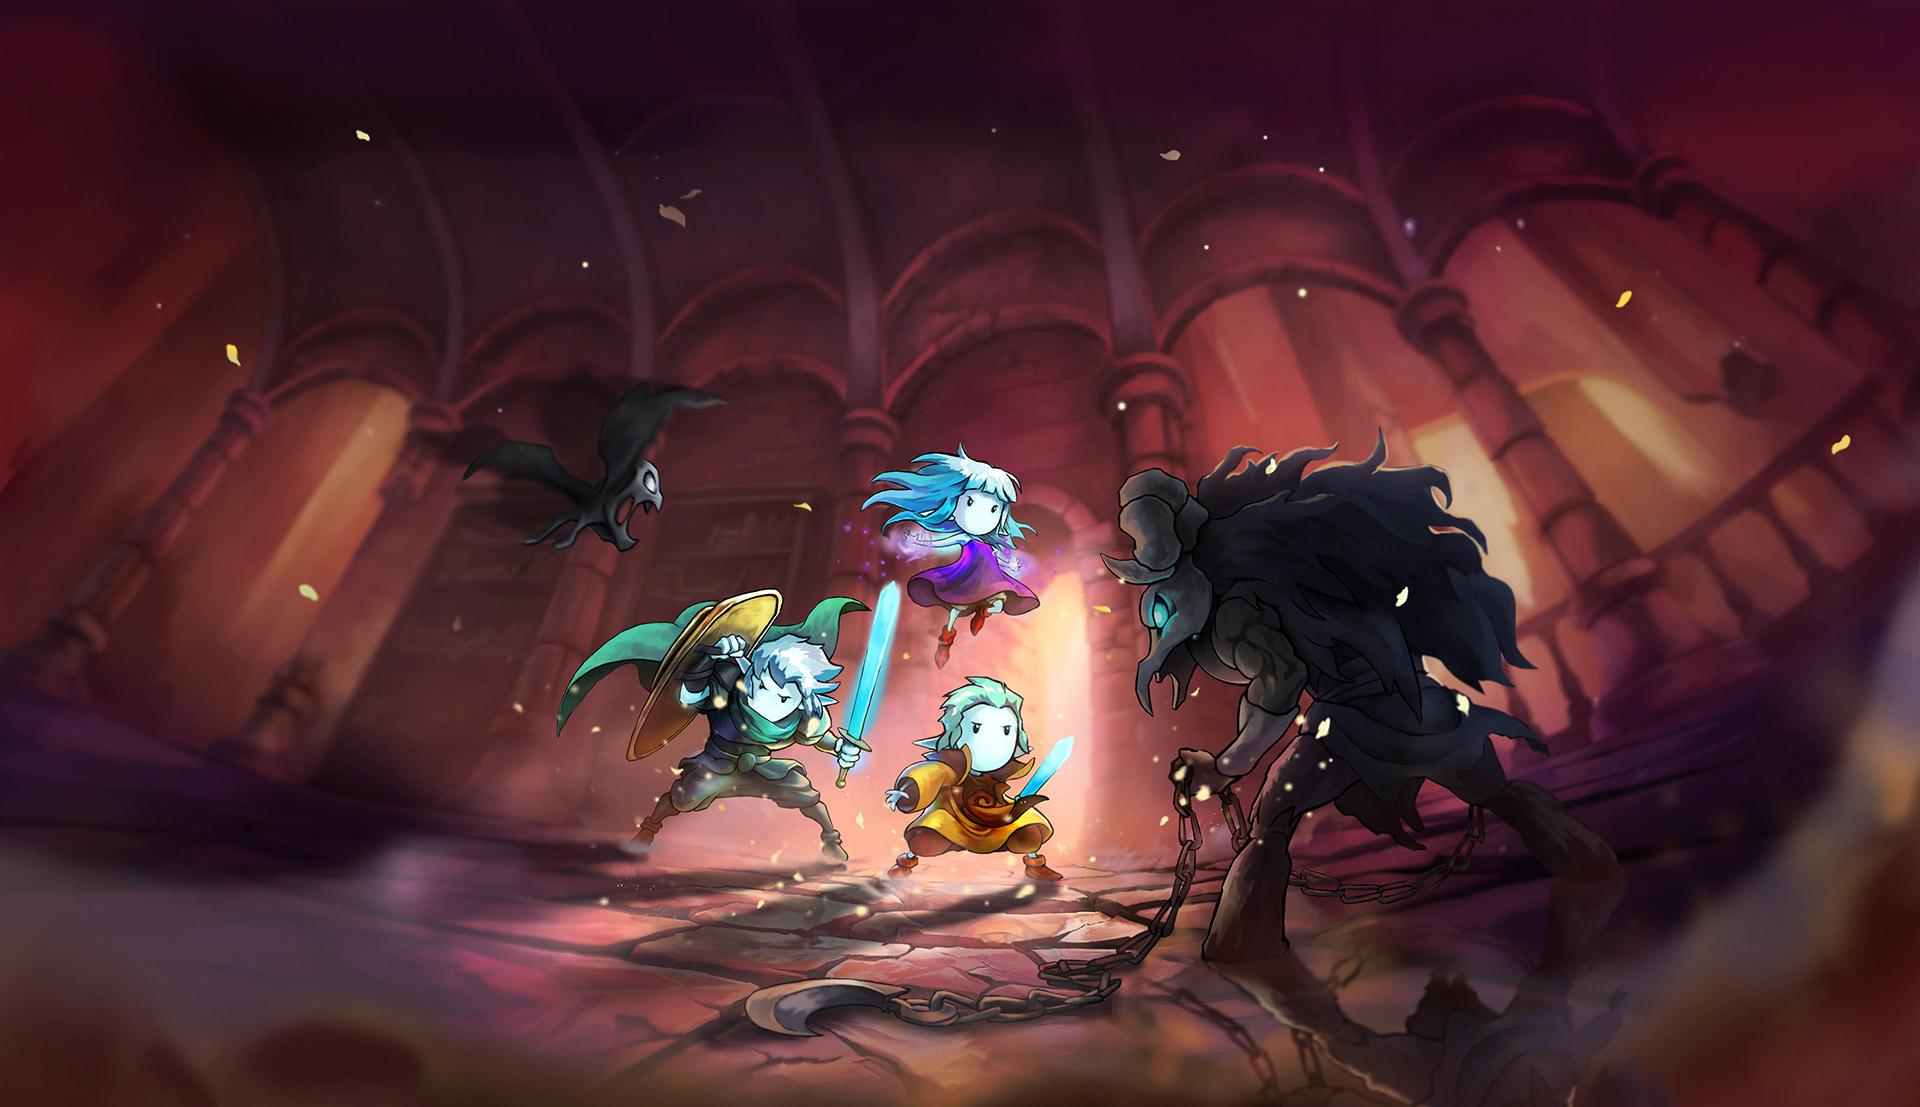 Greak Memories of Azur, l'incantevole avventura disegnata a mano ha una data di uscita